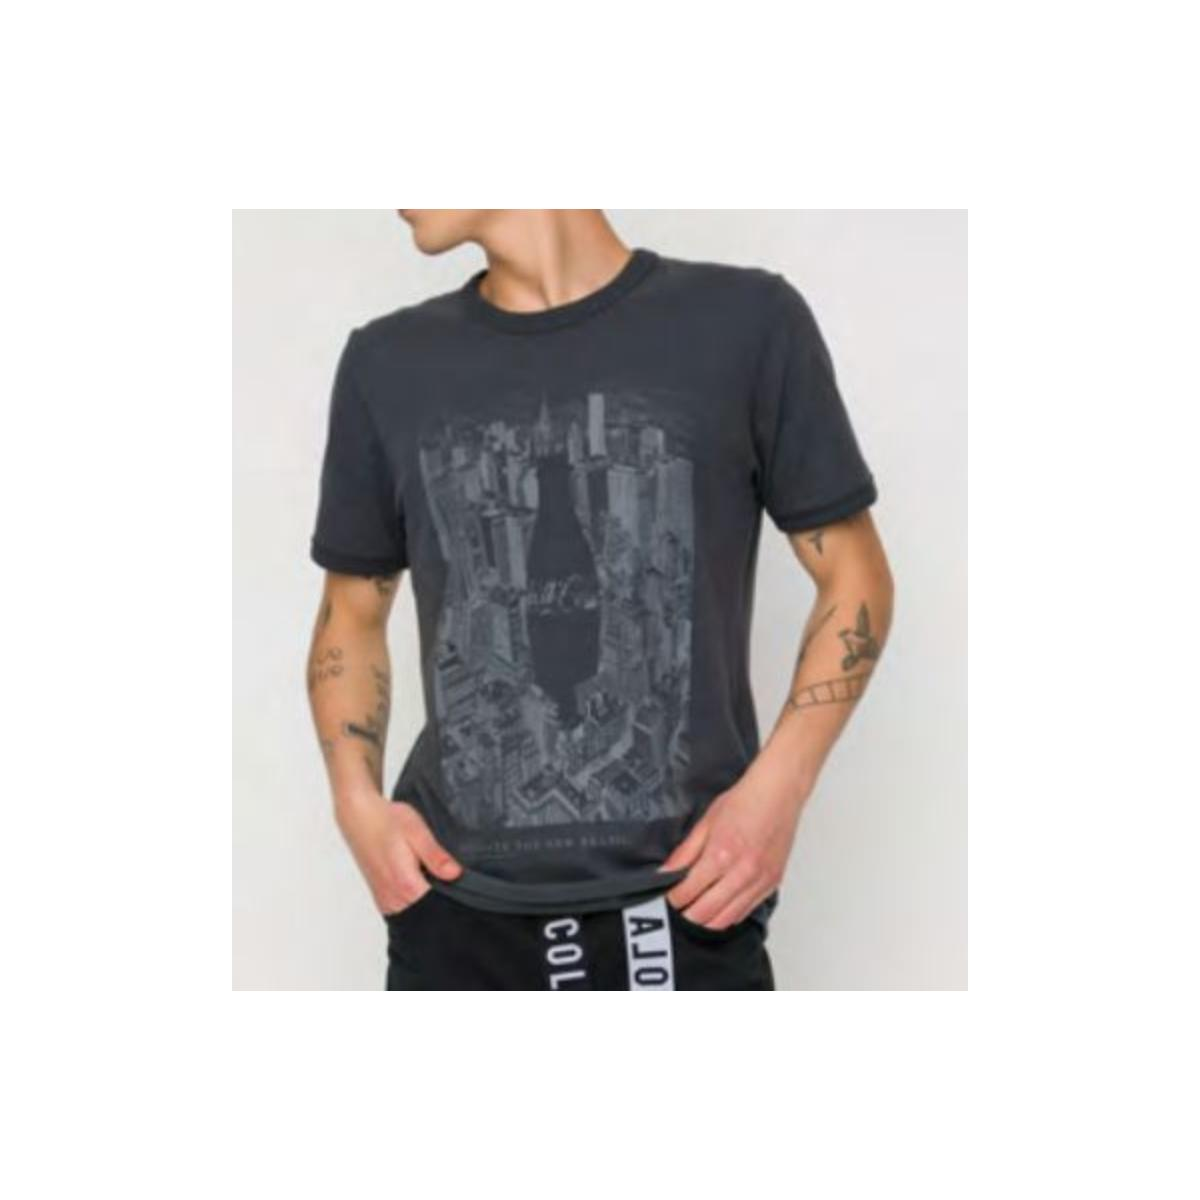 Camiseta Masculina Coca-cola Clothing 353207447 63443 Chumbo